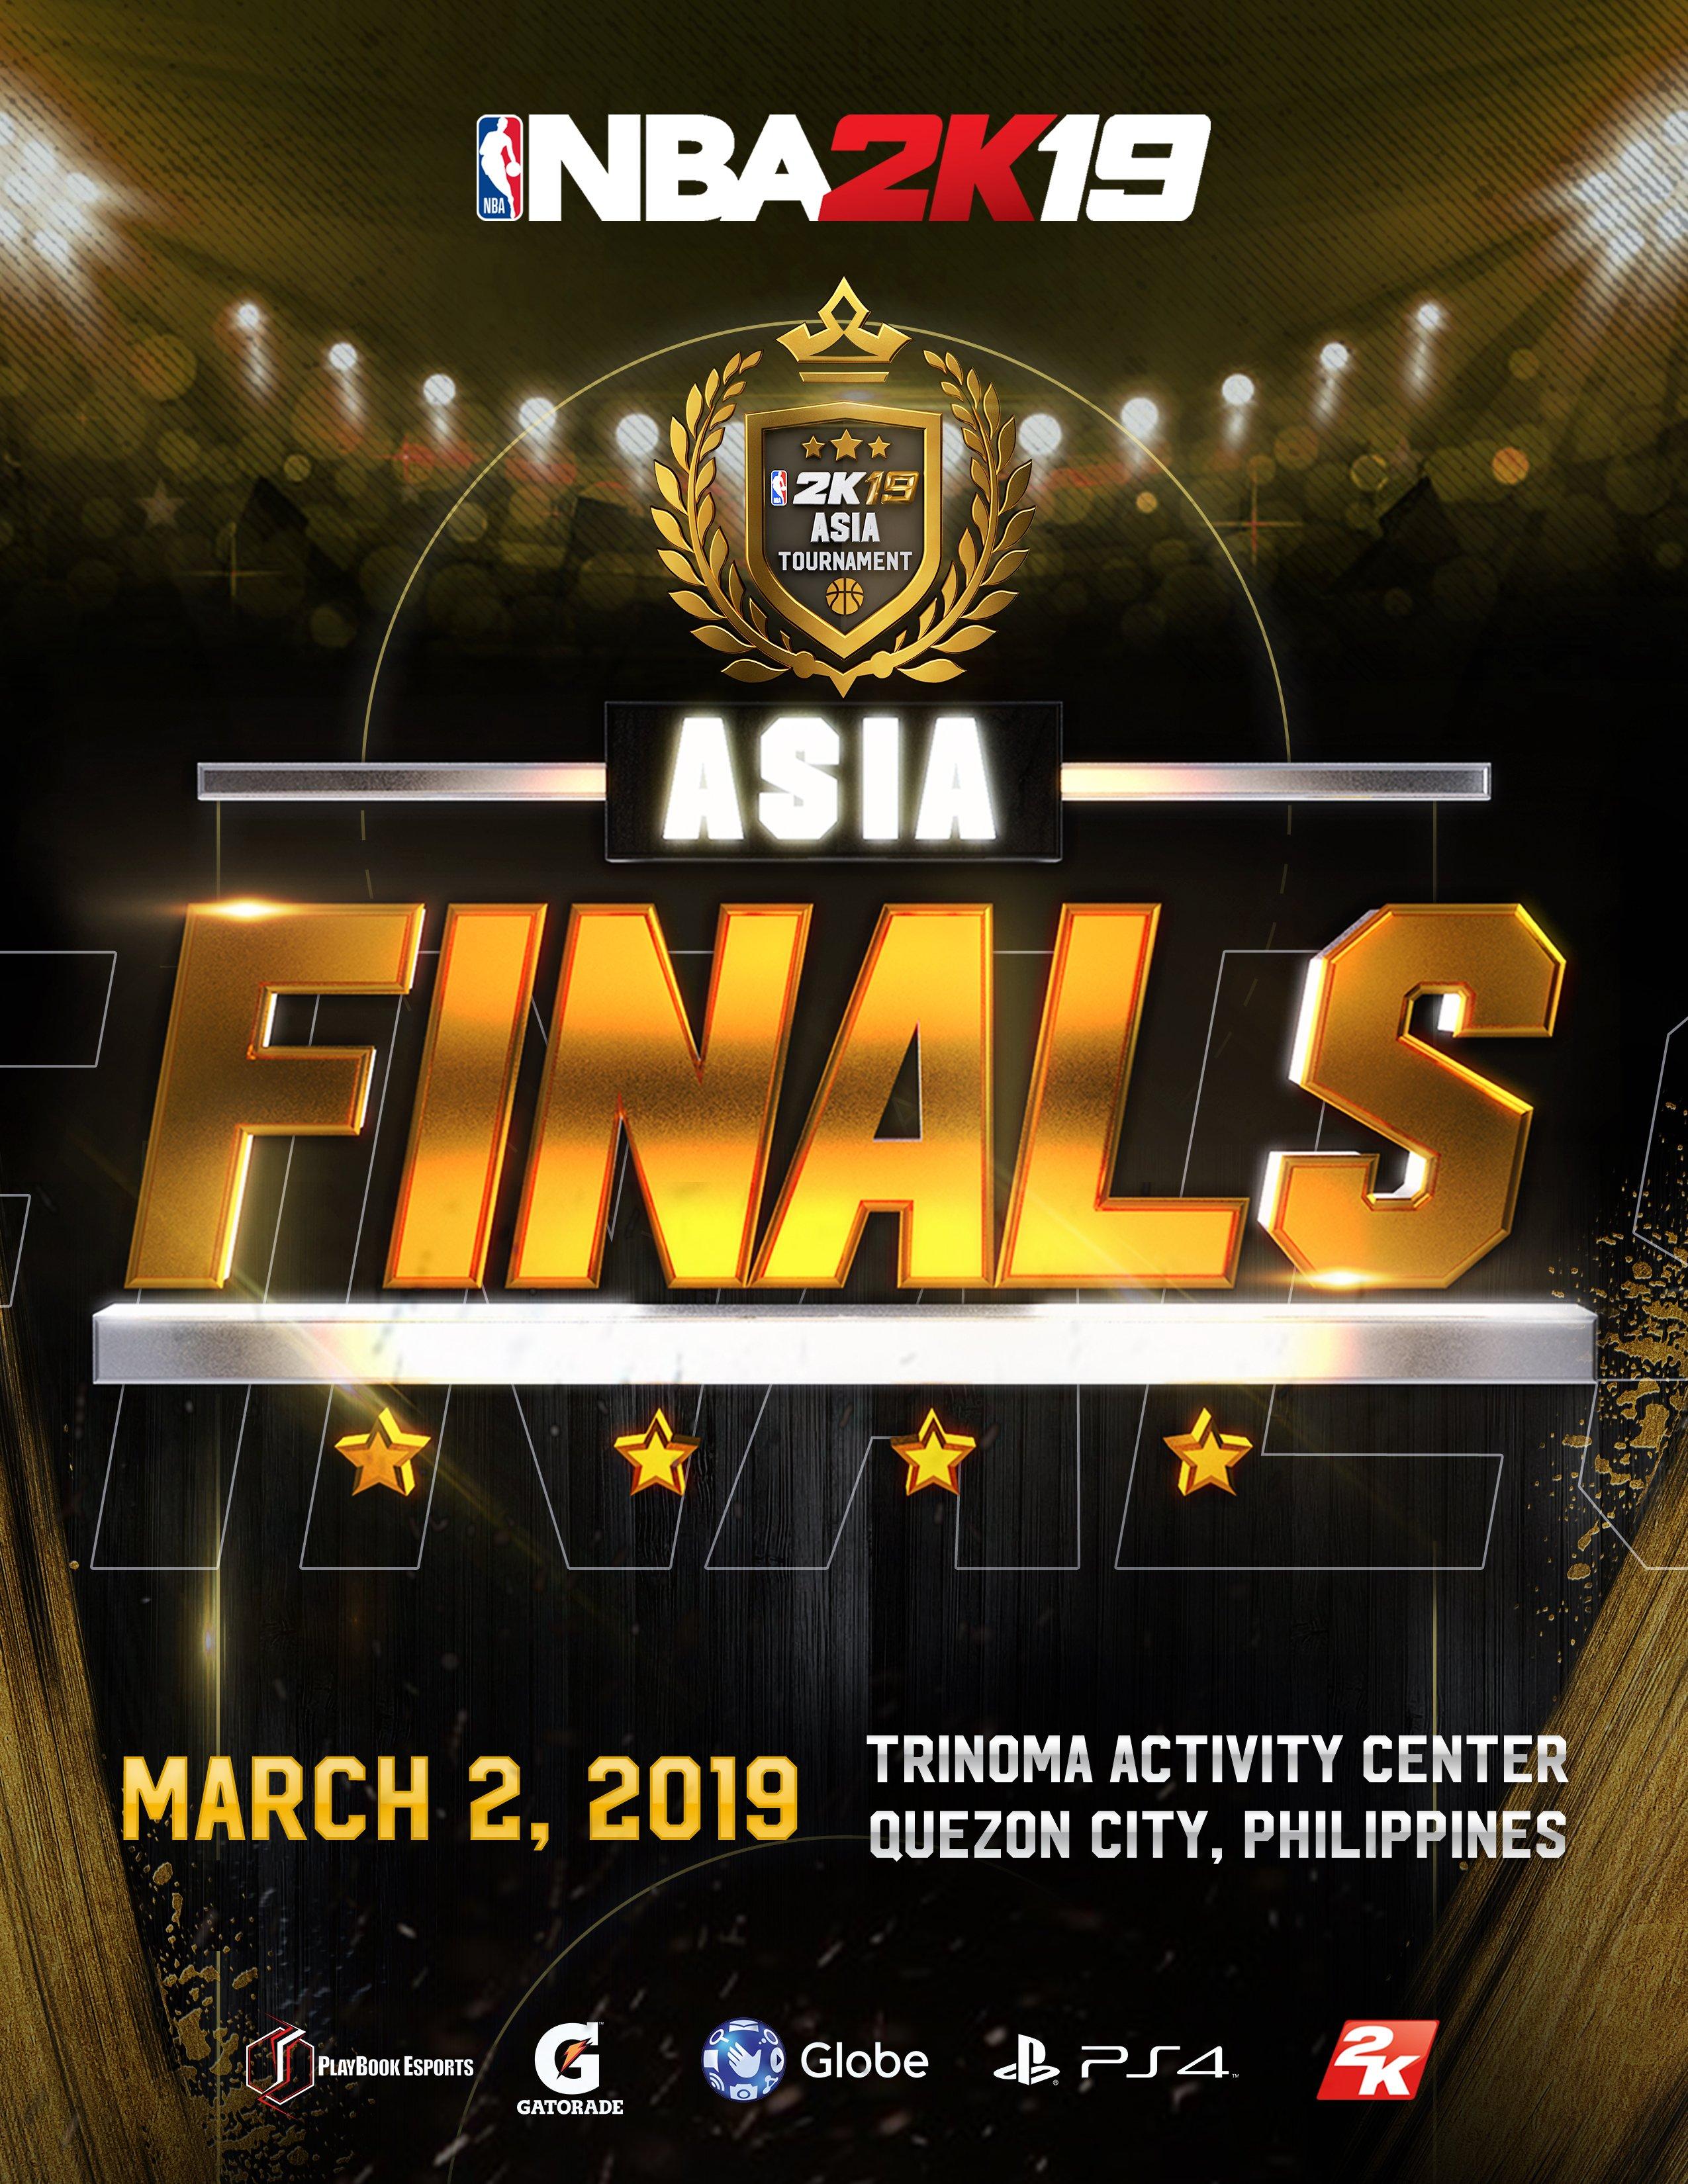 NBA 2K19 Asia Finals Happening This Saturday